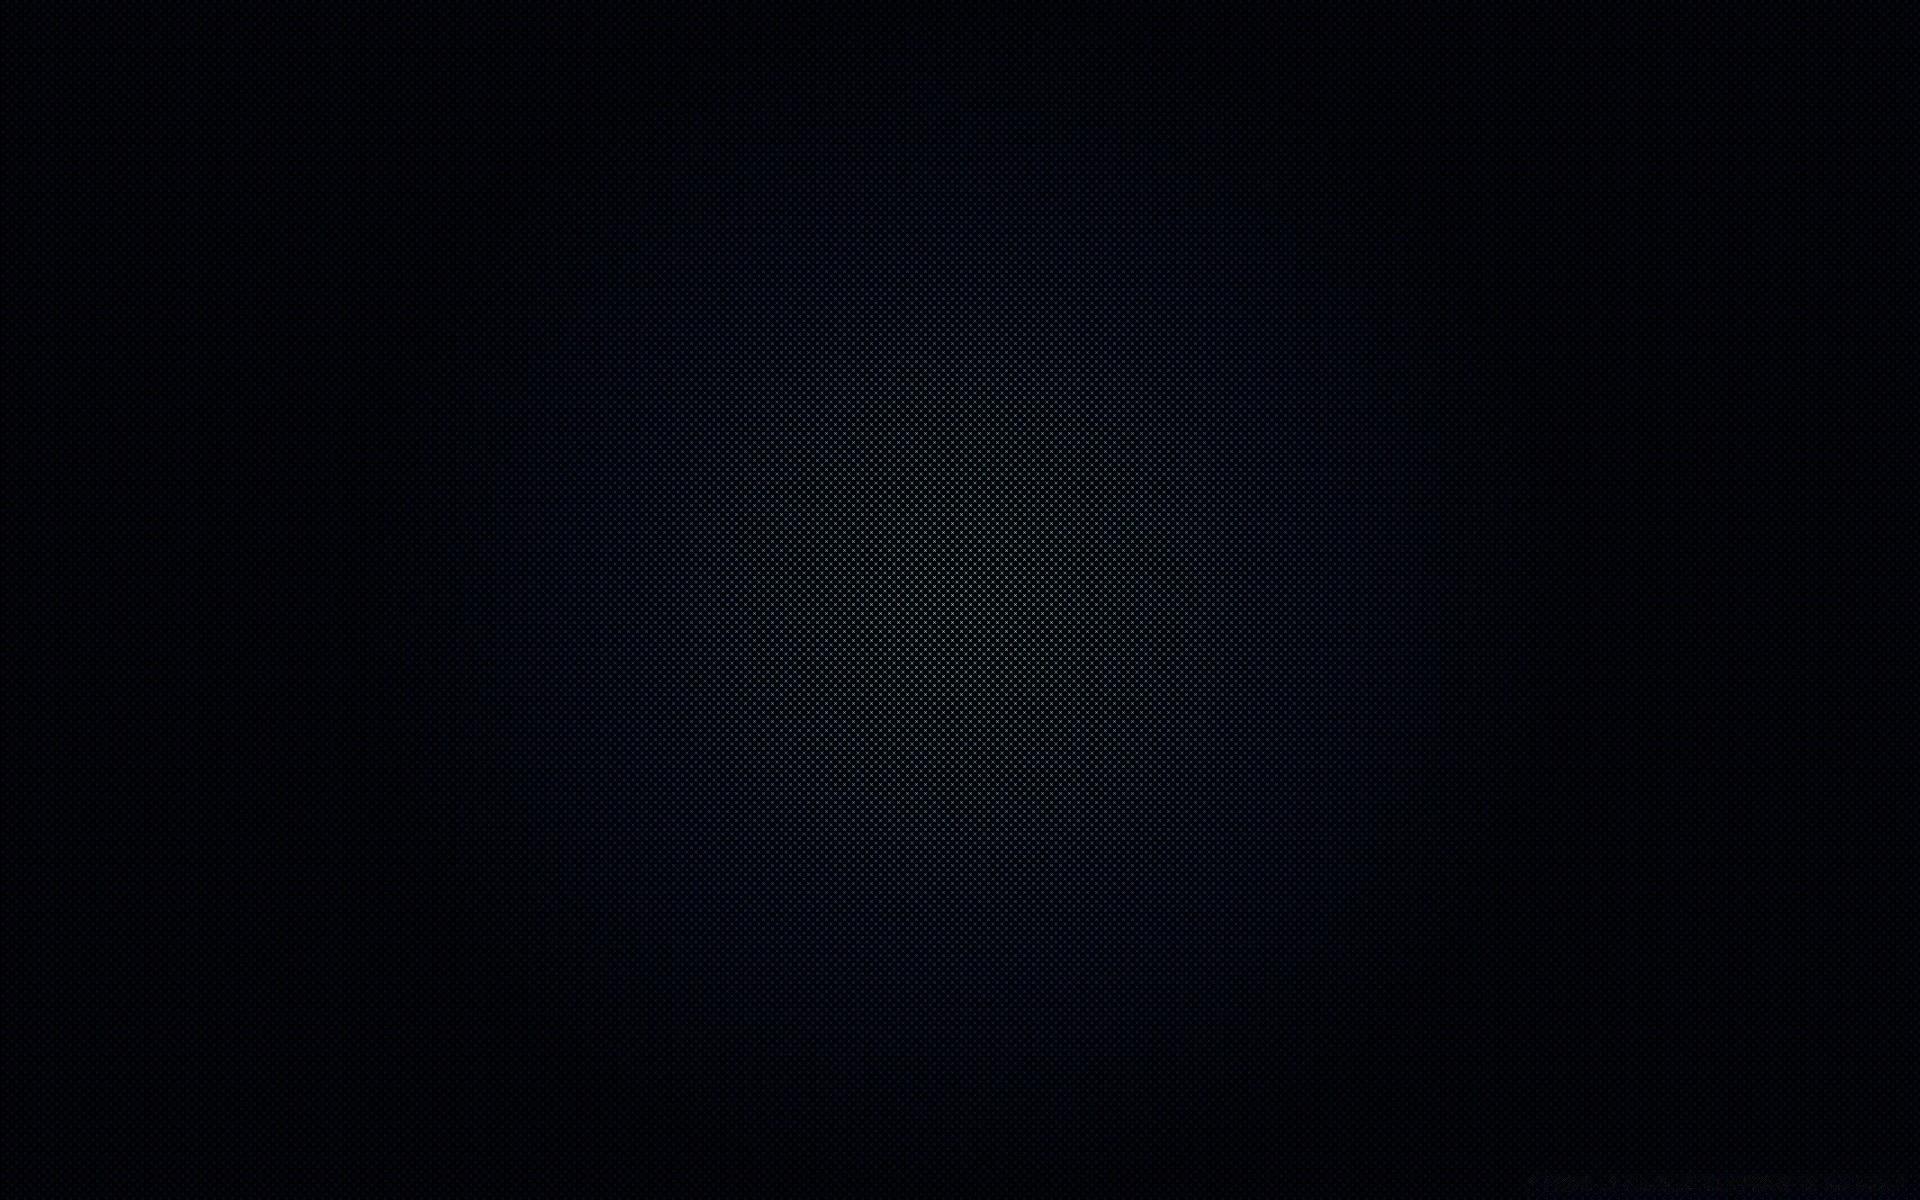 Темный Фон Обои Андроид